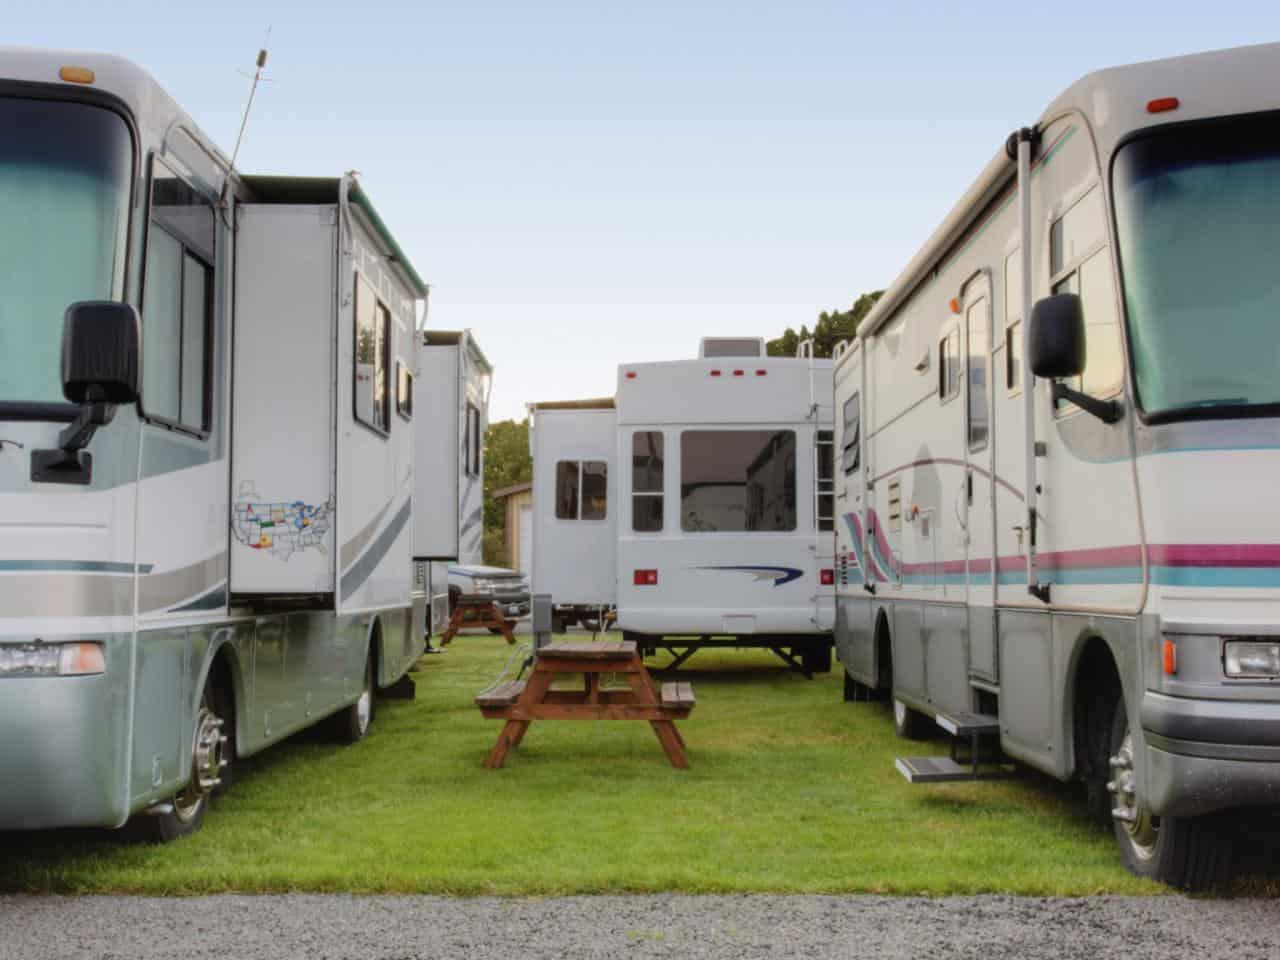 Conveniences An RV Park Offer